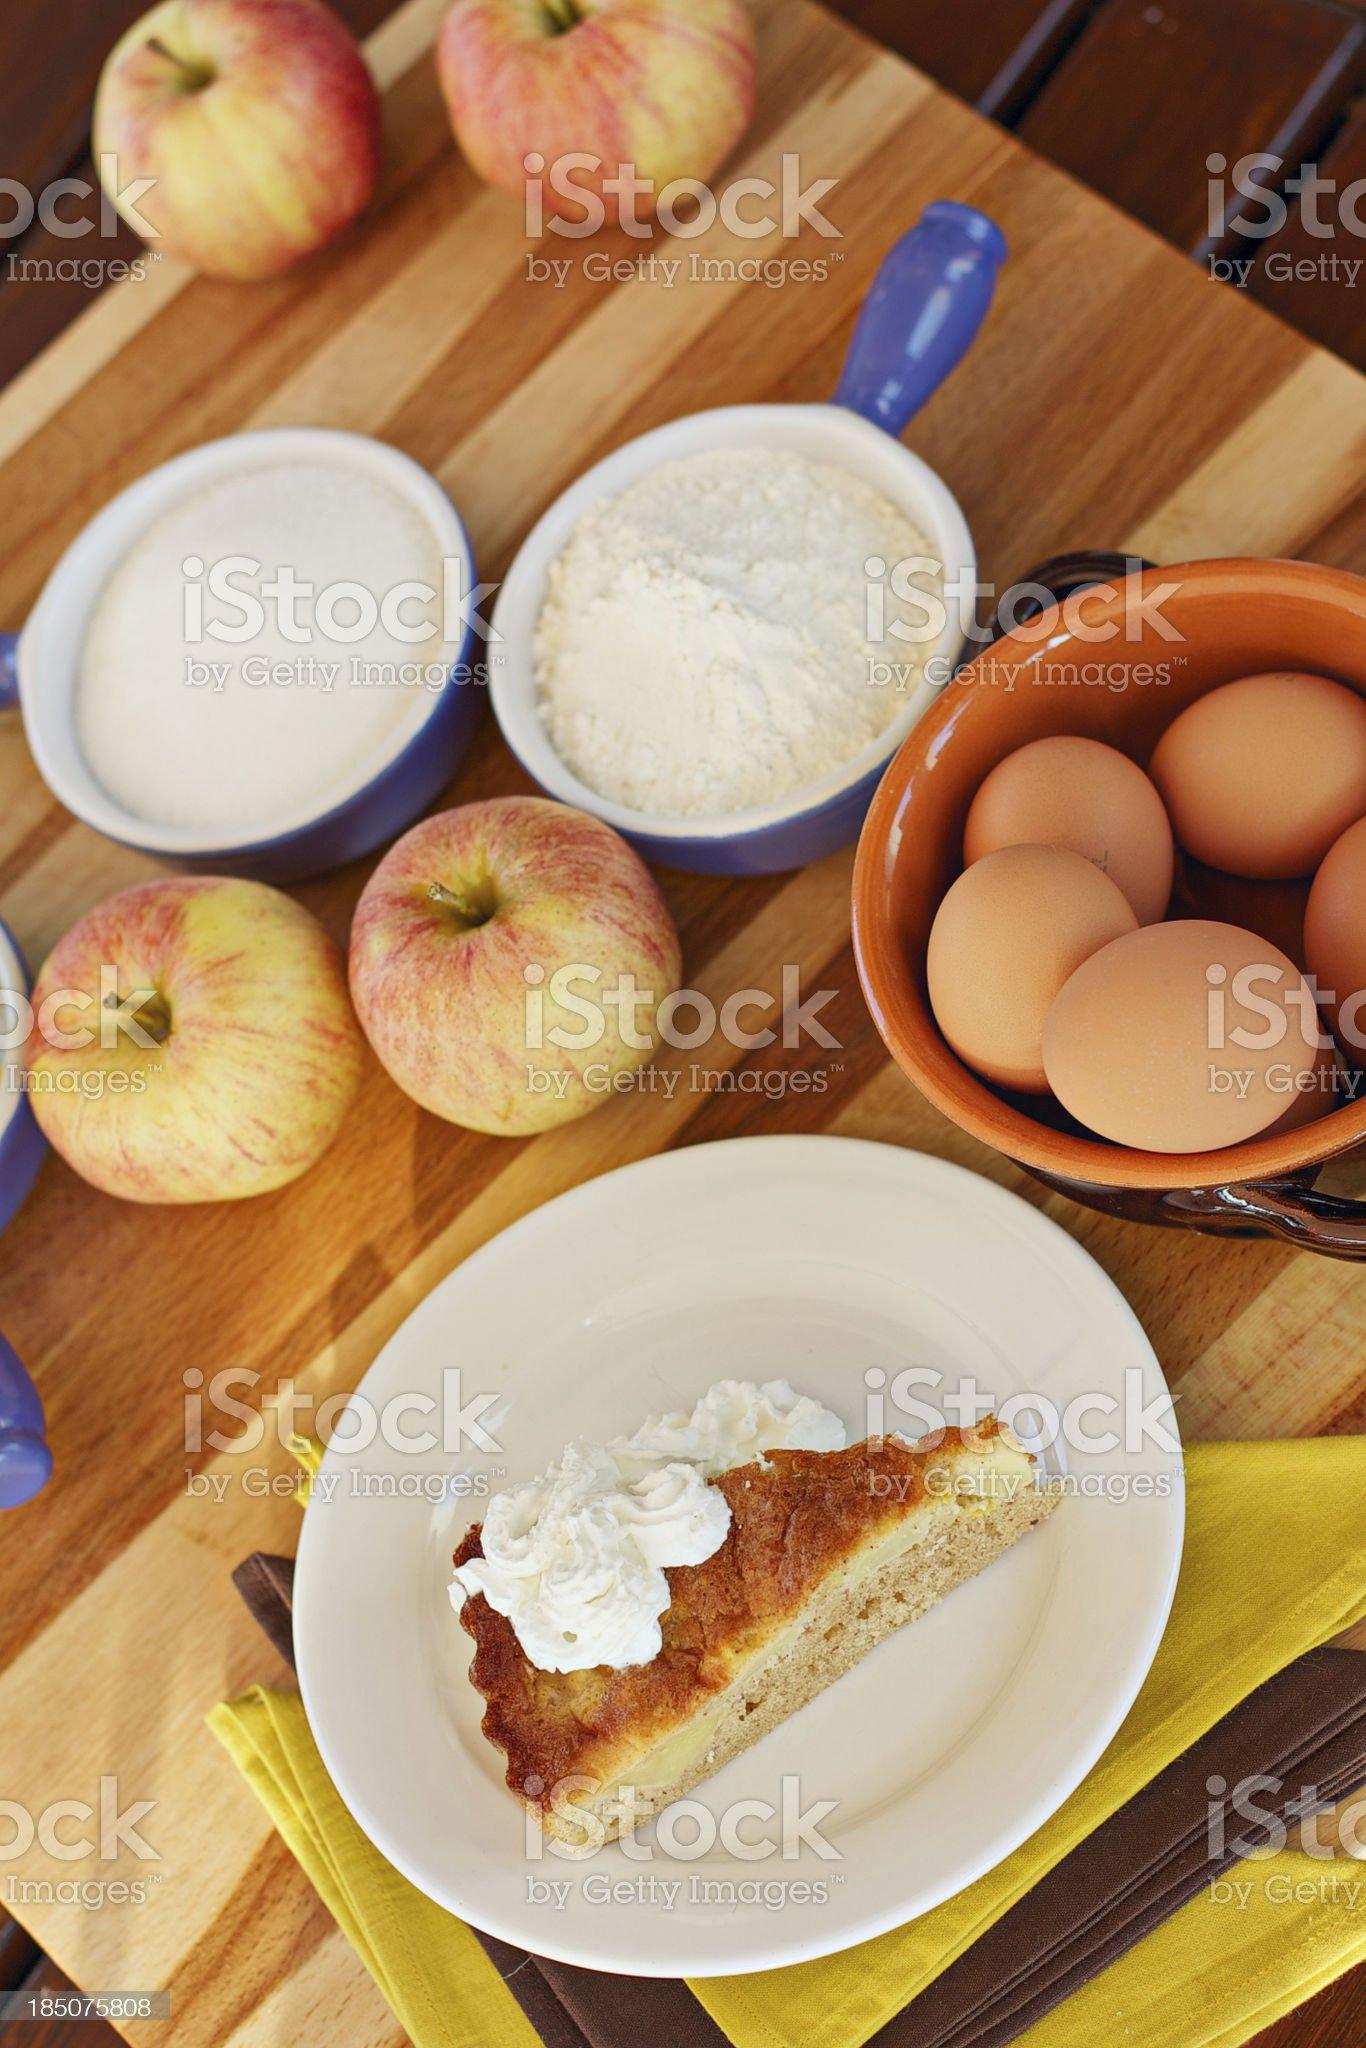 Apple pie slice royalty-free stock photo